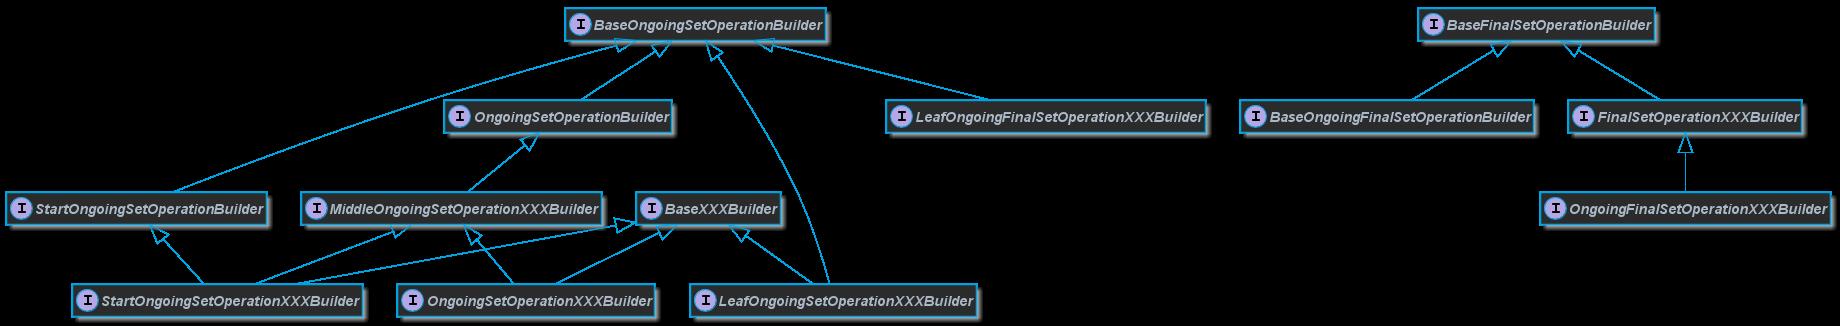 Blaze Persistence - Criteria API for JPA backends